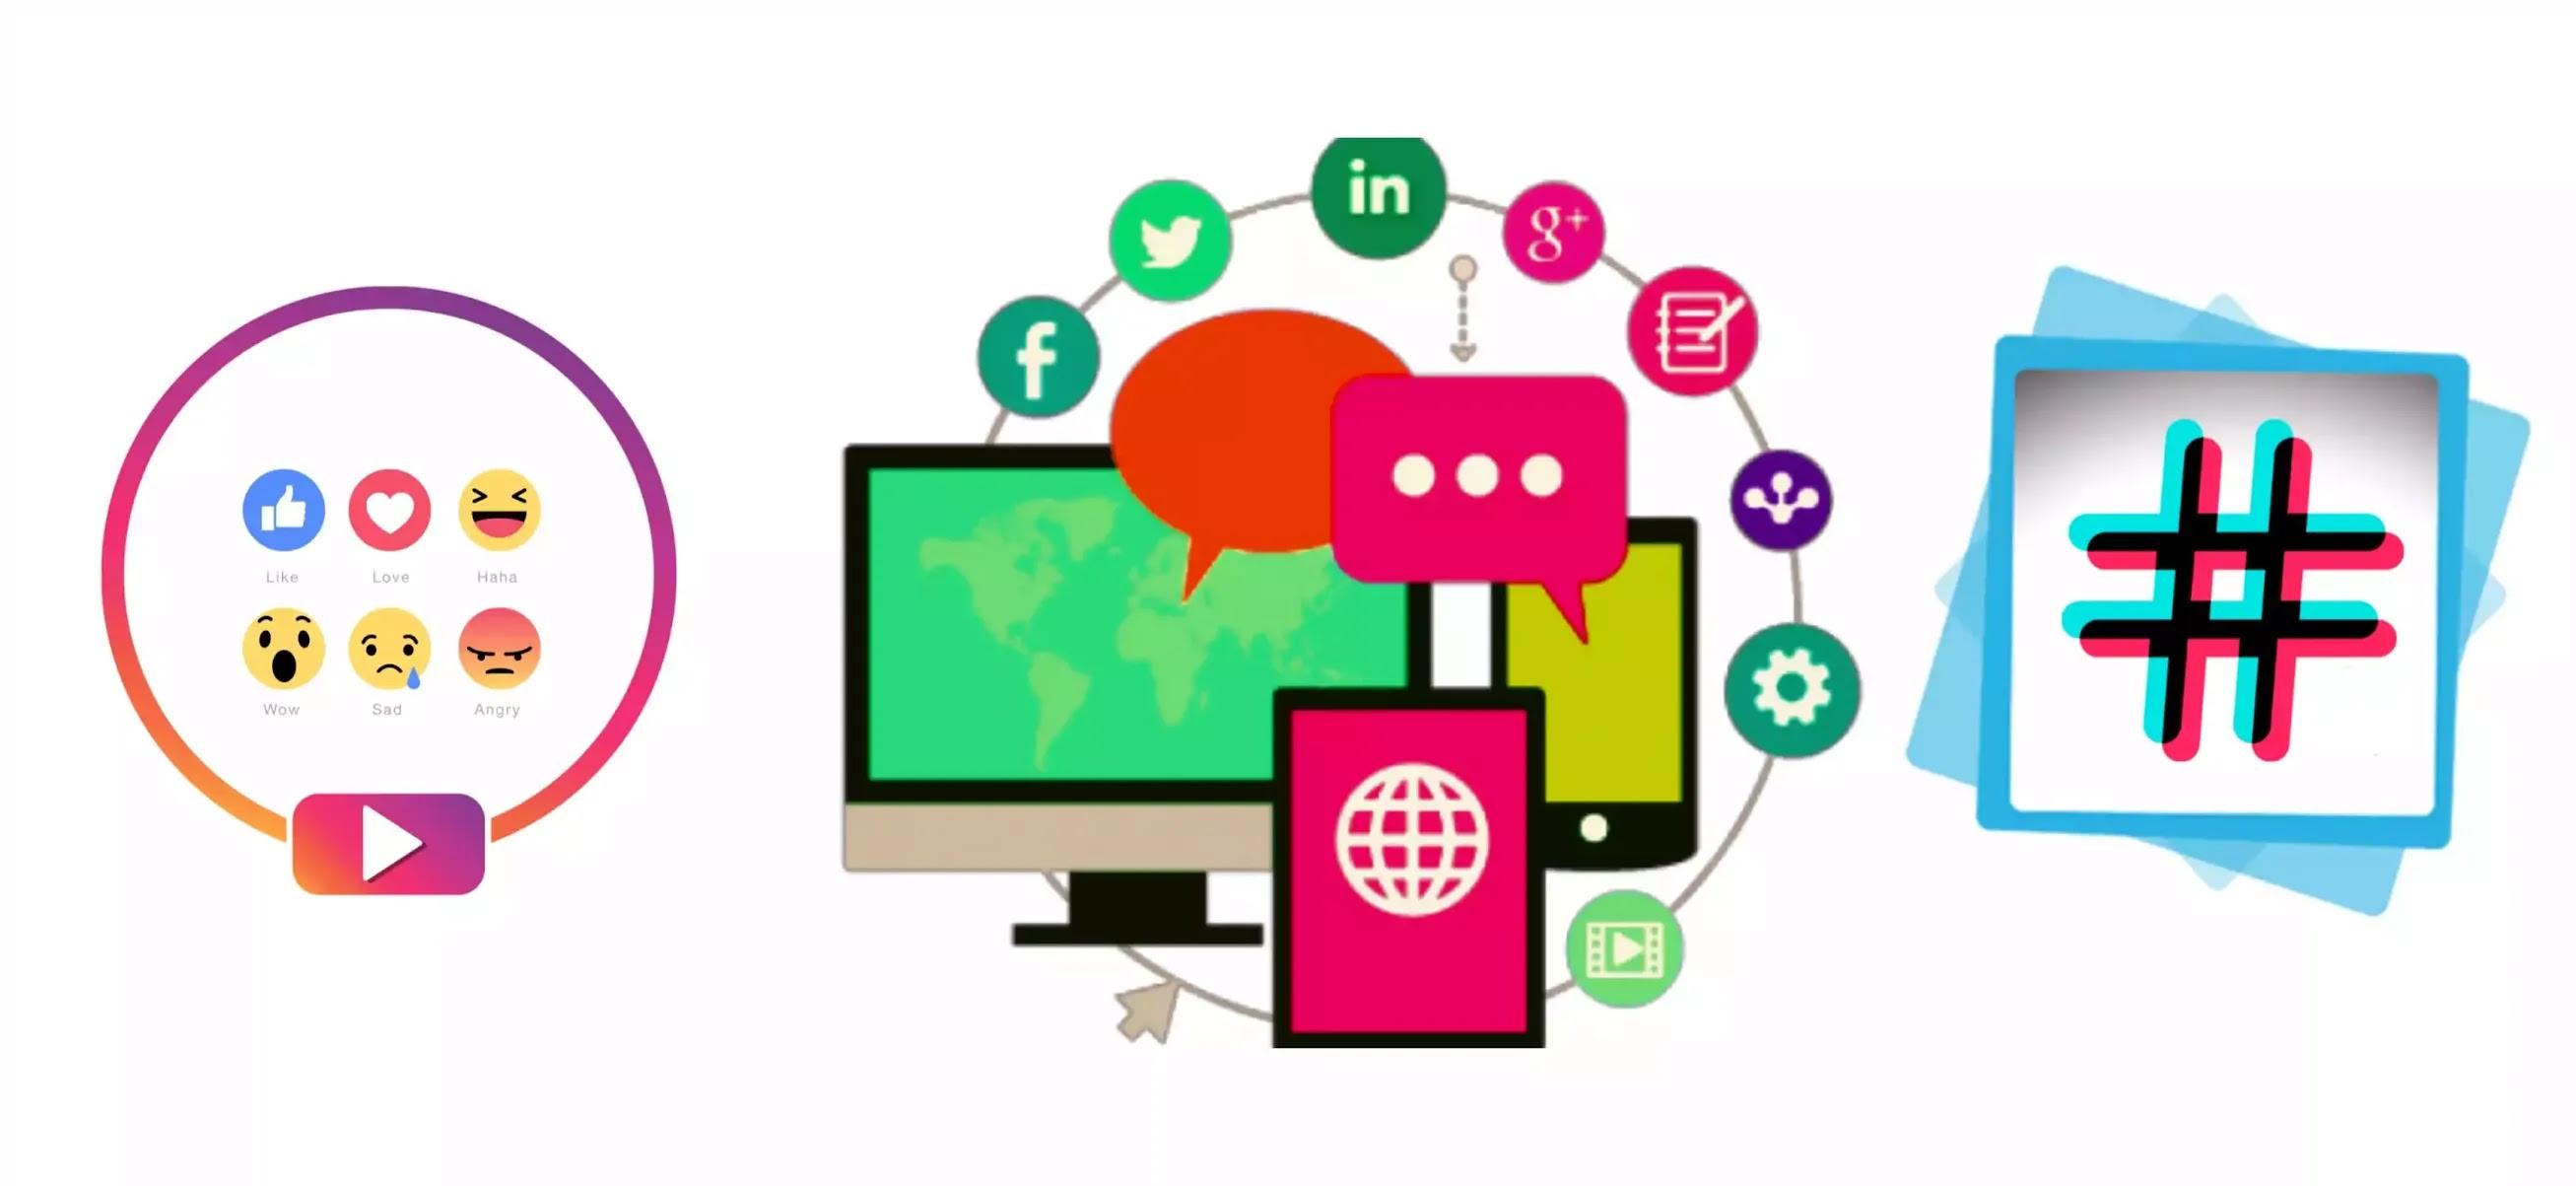 Medium,Pinterest,Facebook,Twitter,LinkedIn,Group,Pocket,Instrgram,YouTube,QuuuPromote,IGTV,Quote,Flipboard,AllTop,Reddit,